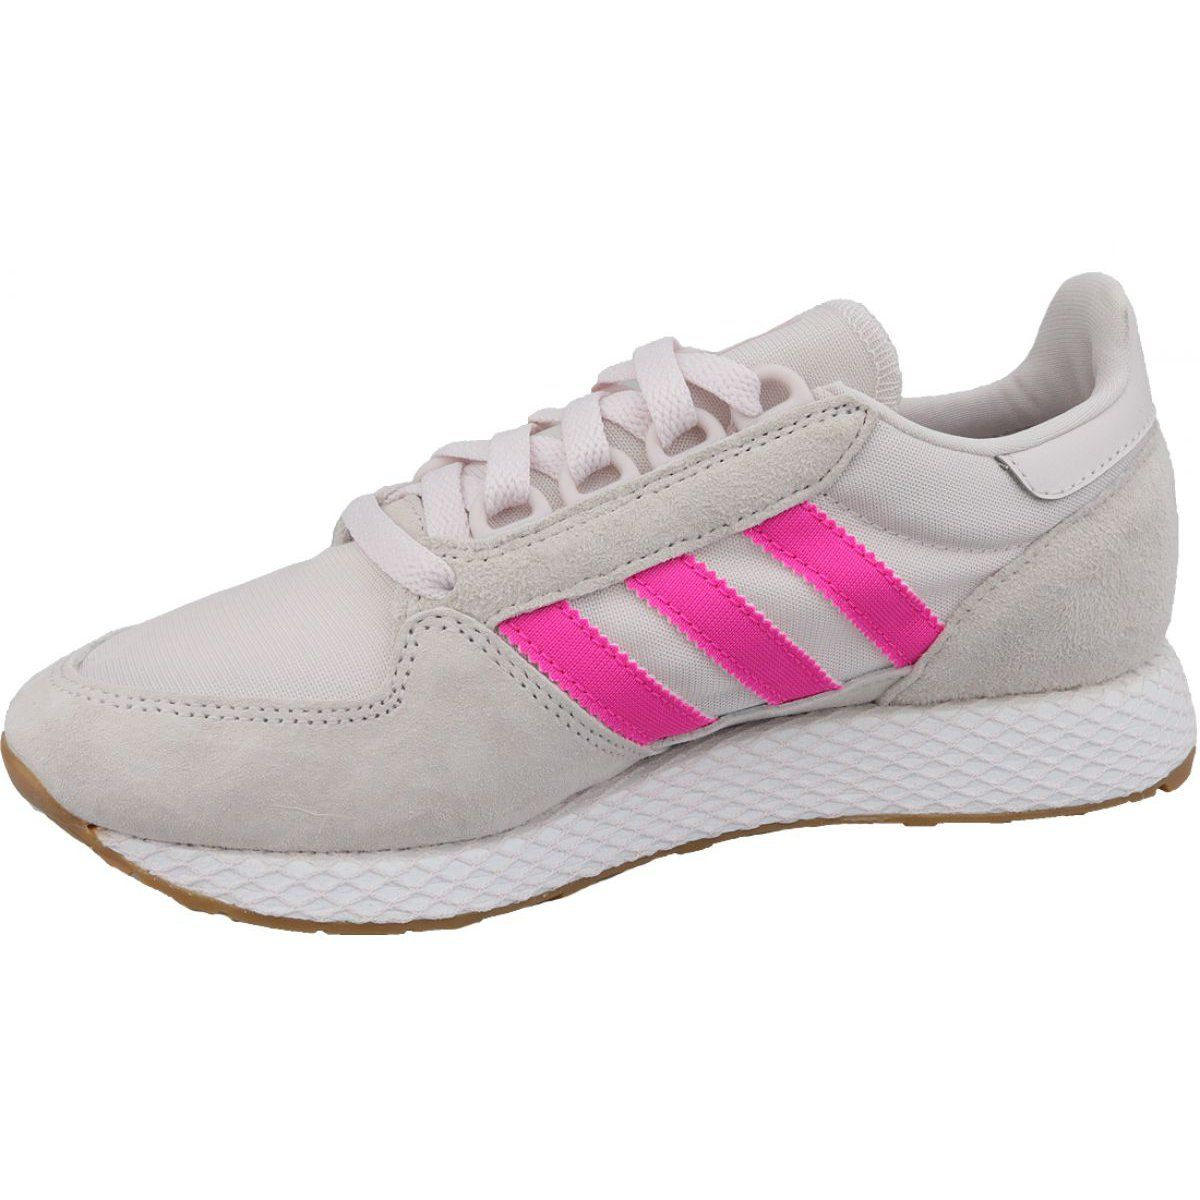 Buty Adidas Forest Grove W Ee5847 Biale Adidas Sports Footwear Adidas Shoes Women